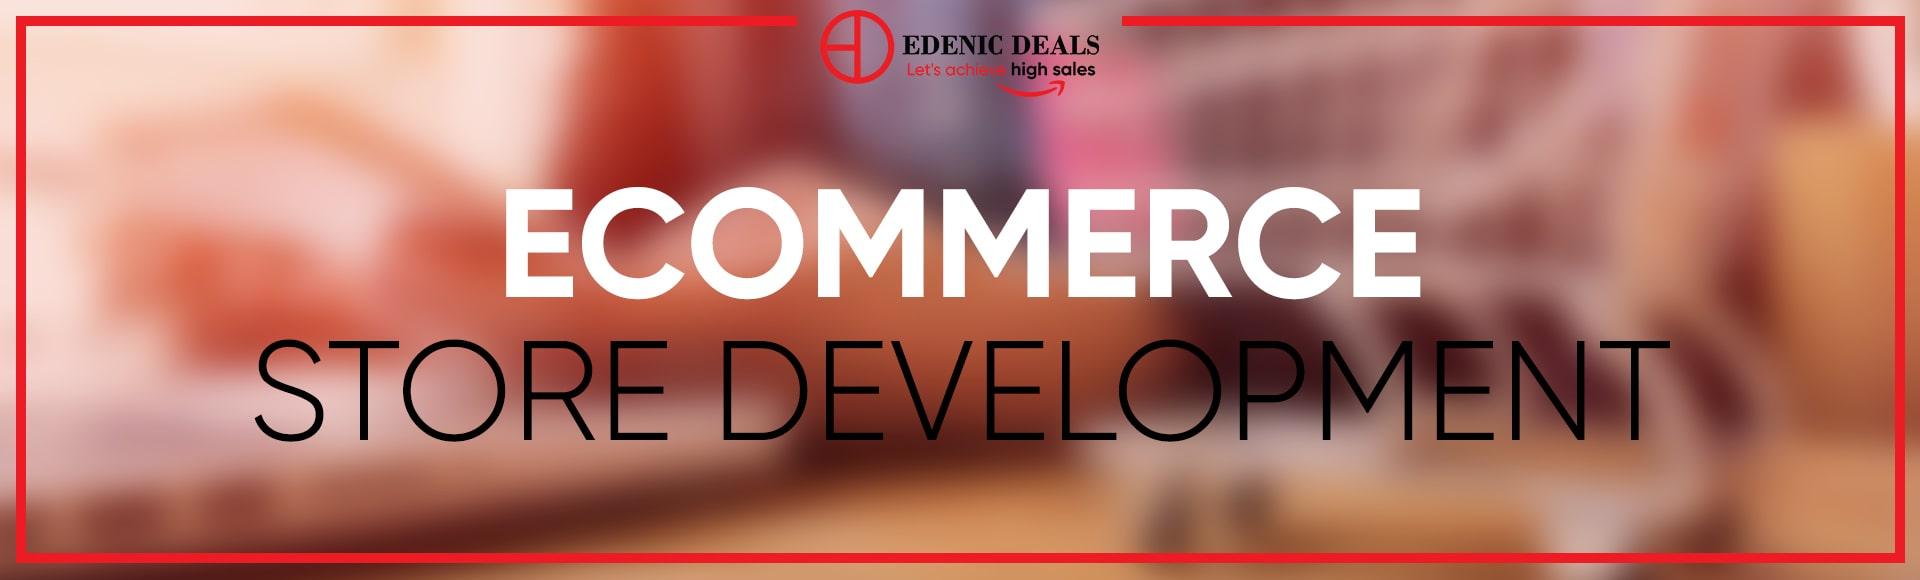 ecommerce store development Edenic Deals